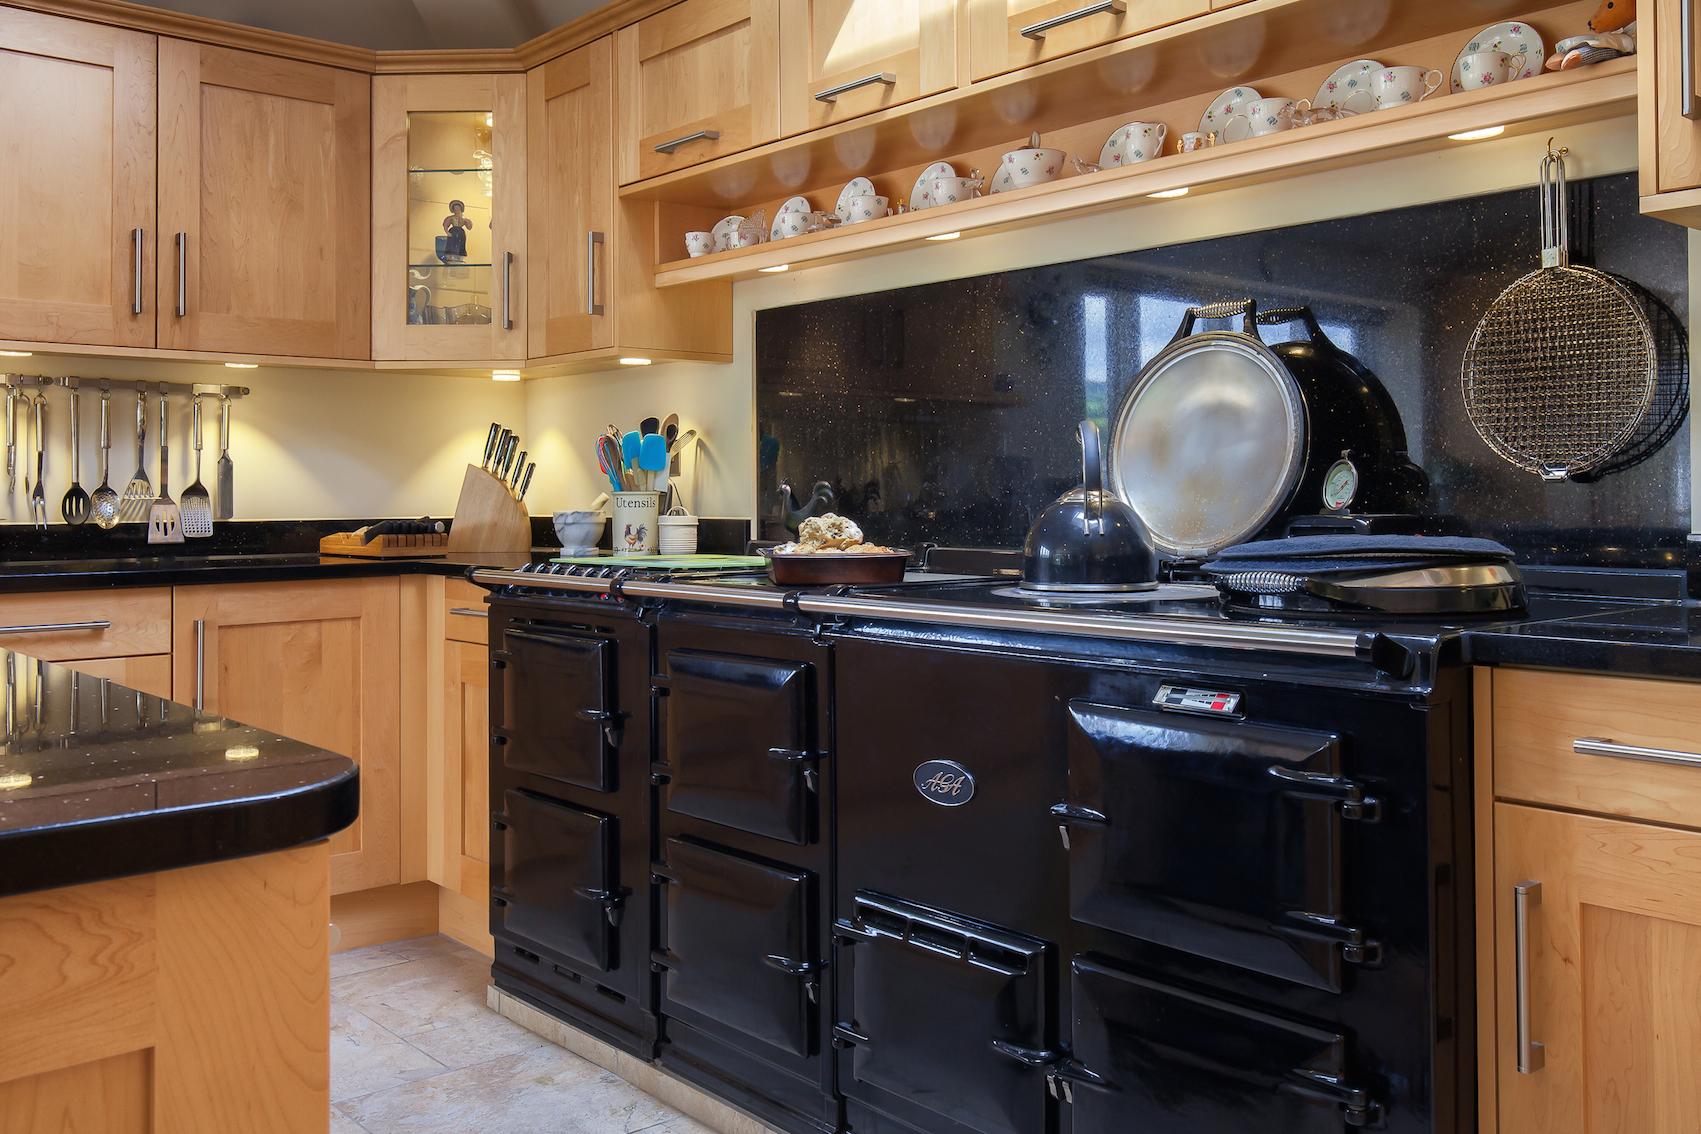 Full day Aga  cookery course-Shaldon Devon